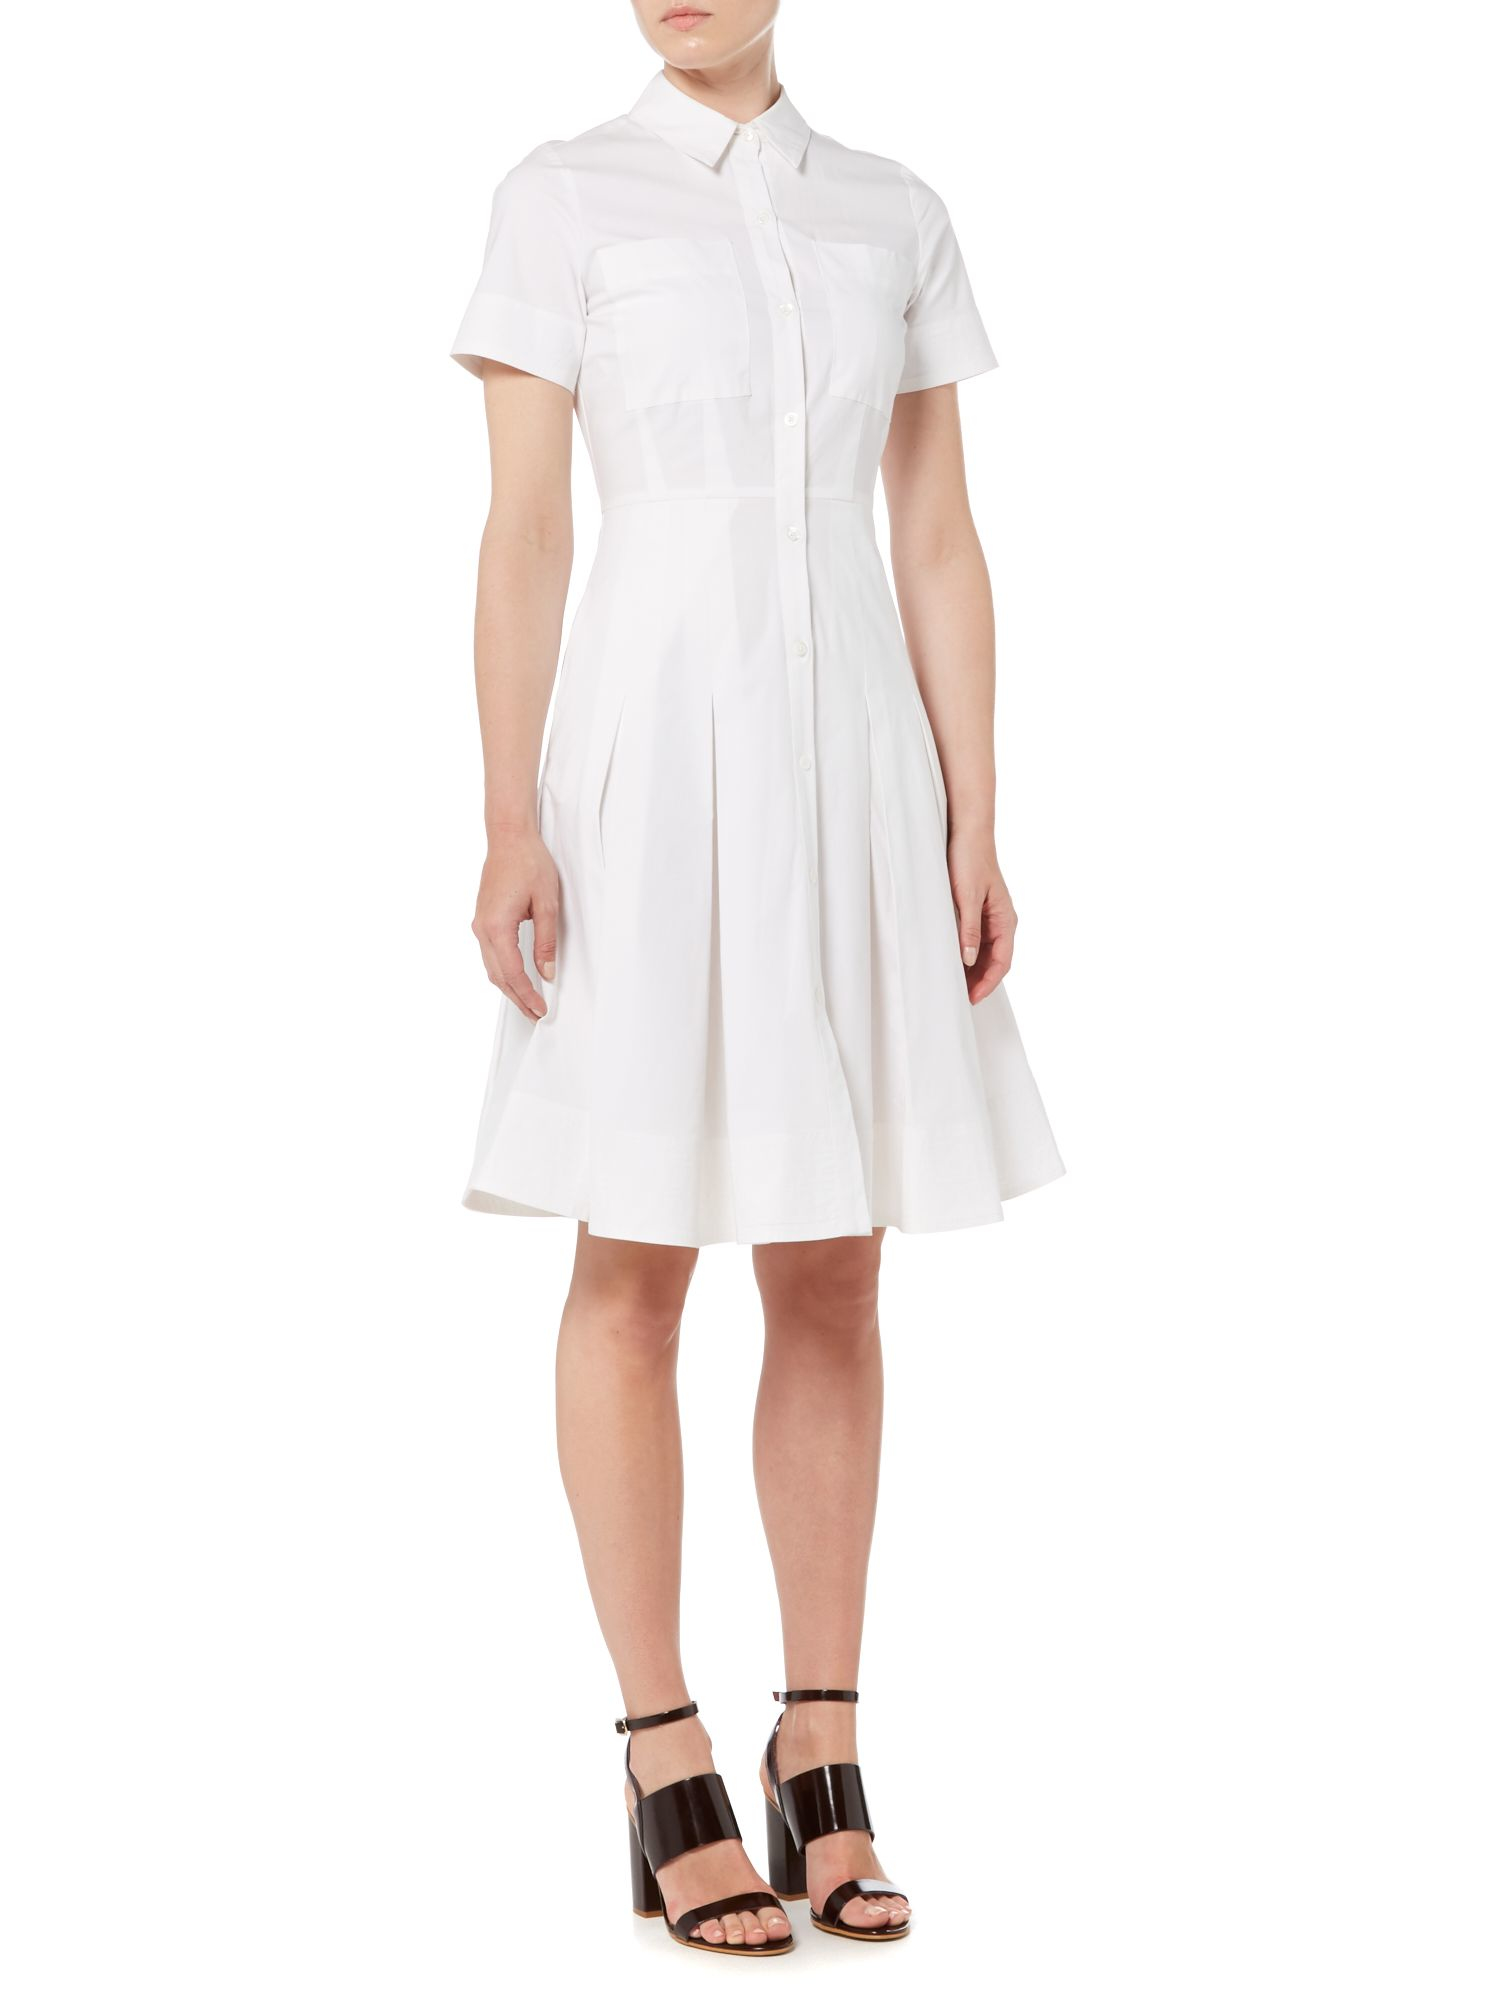 Lyst michael kors short sleeve shirt dress in white for Short sleeve white dress shirt